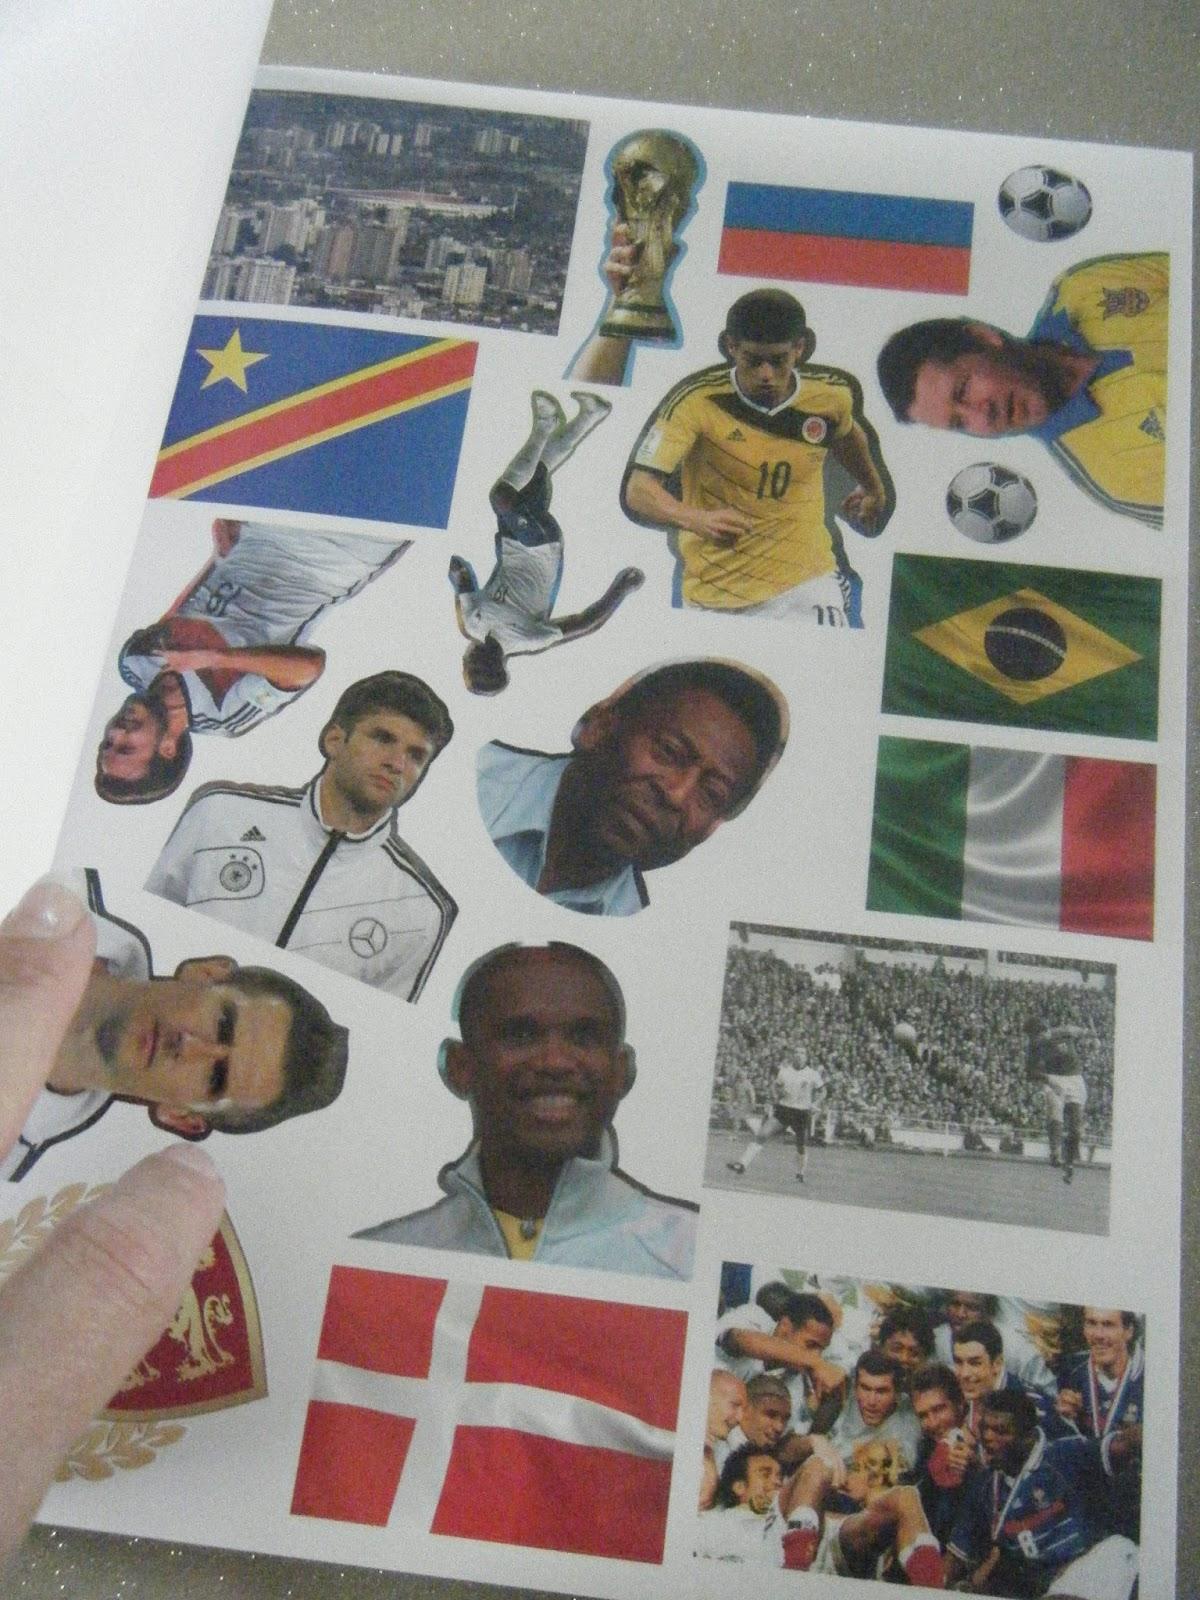 Les taratatas de sandra football mon livre collector de gr nd - 200 euros en livres ...